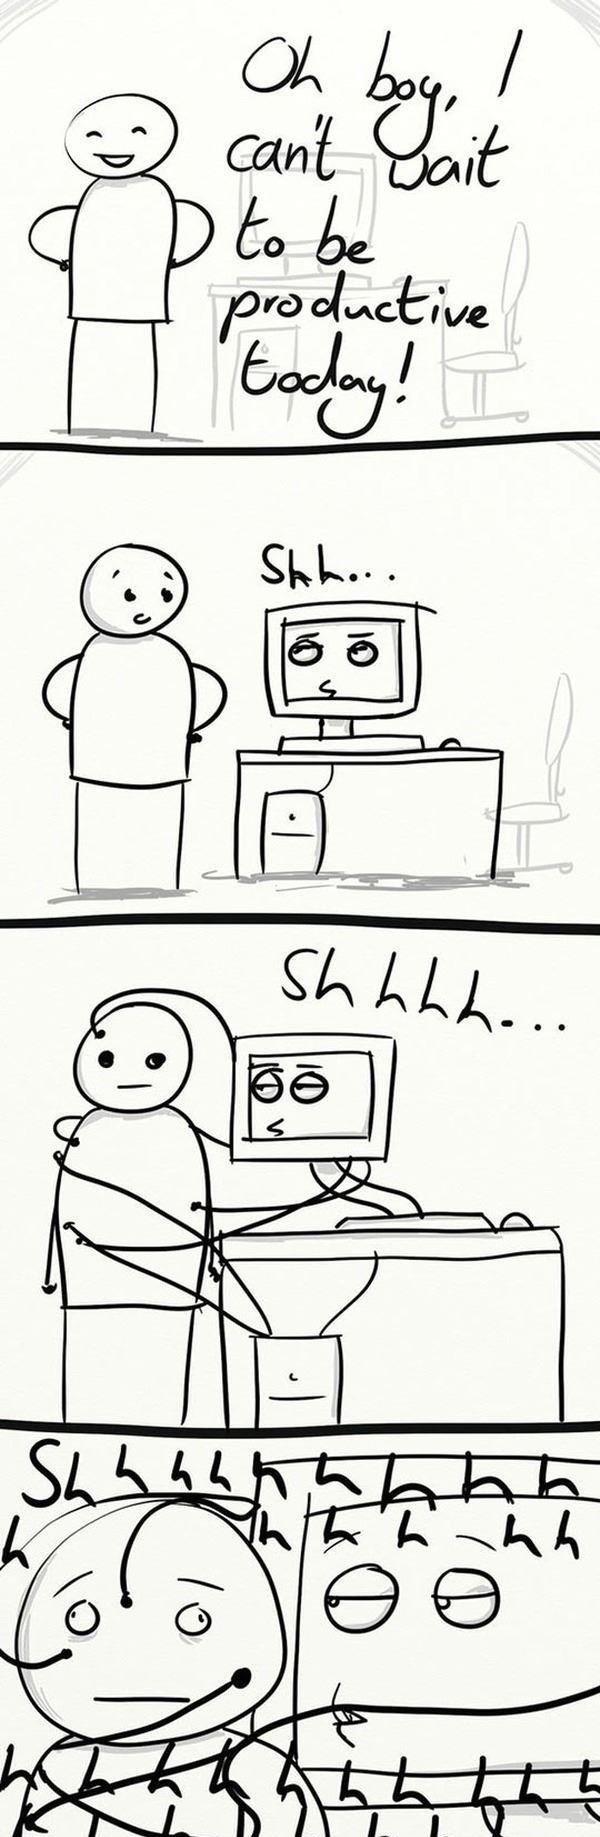 sleep is for the weak. .. Man, I wish my computer had hands! >.>